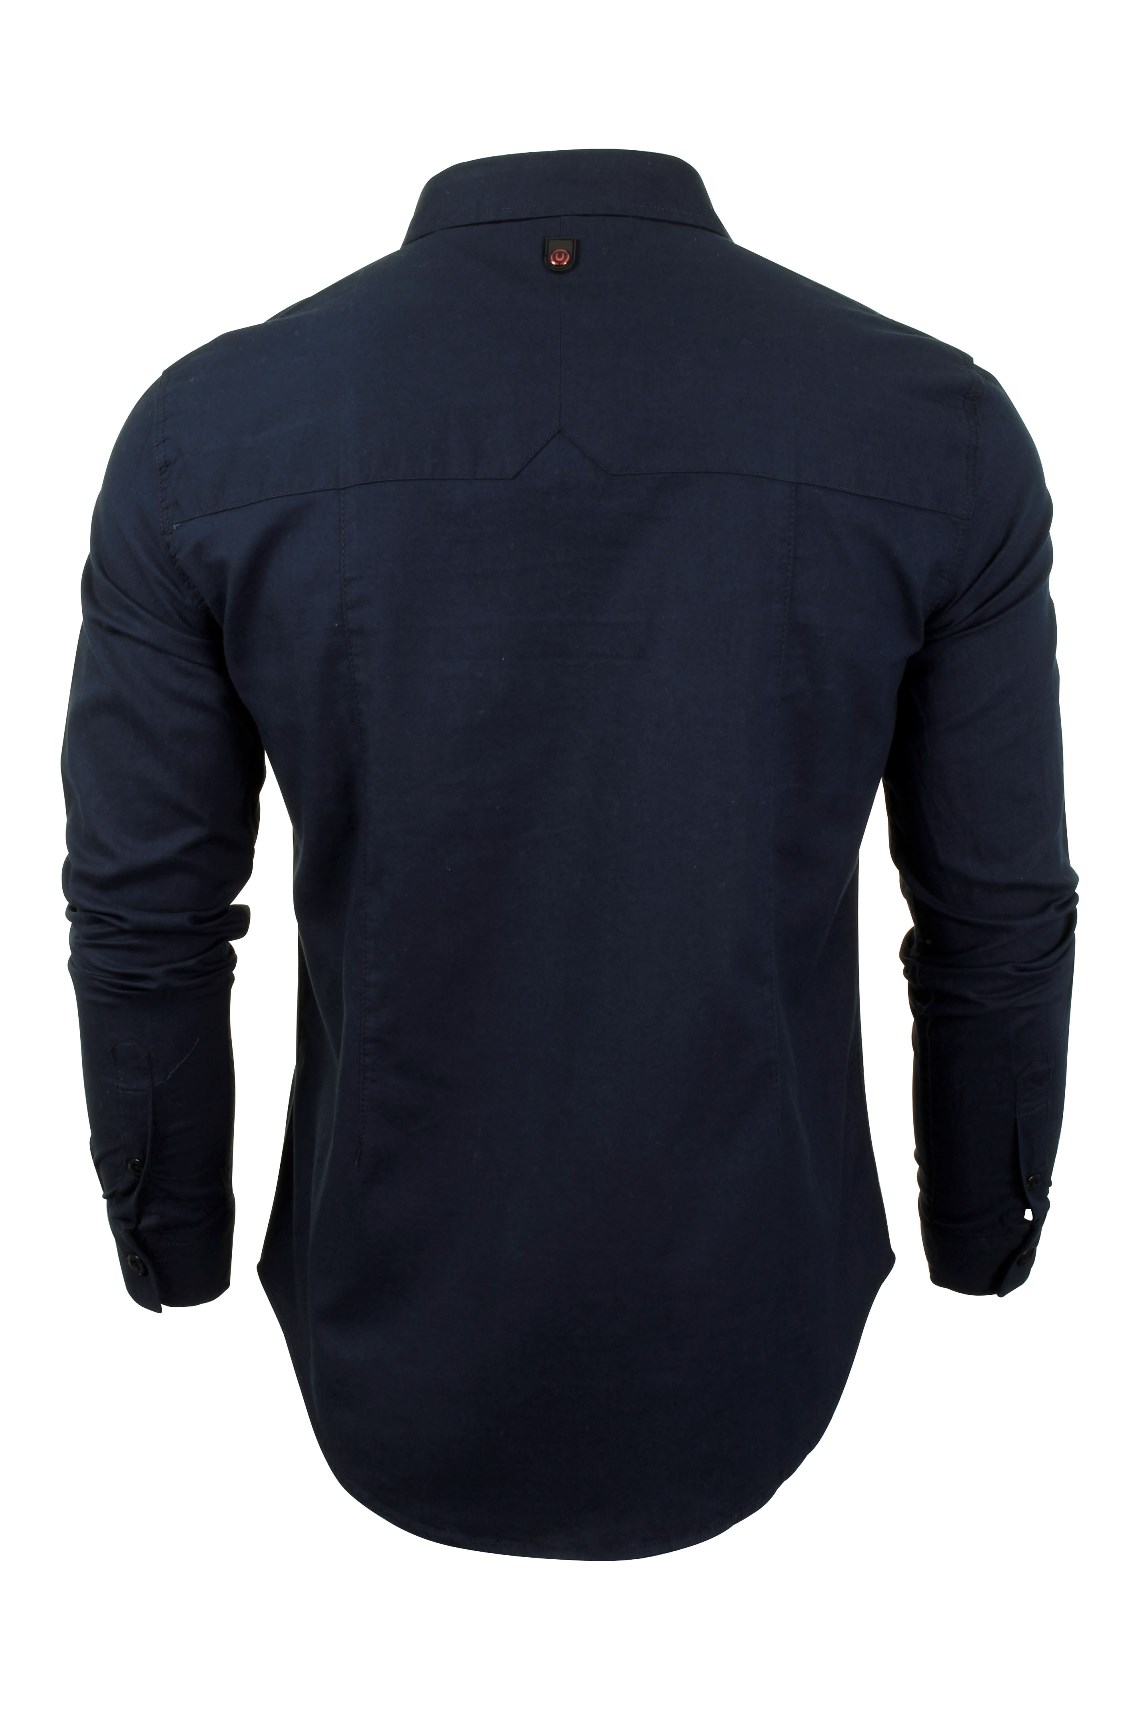 Para-Hombre-Franela-Camisa-por-Pato-Y-Cubierta-039-Katlego-039-Manga-Larga miniatura 11